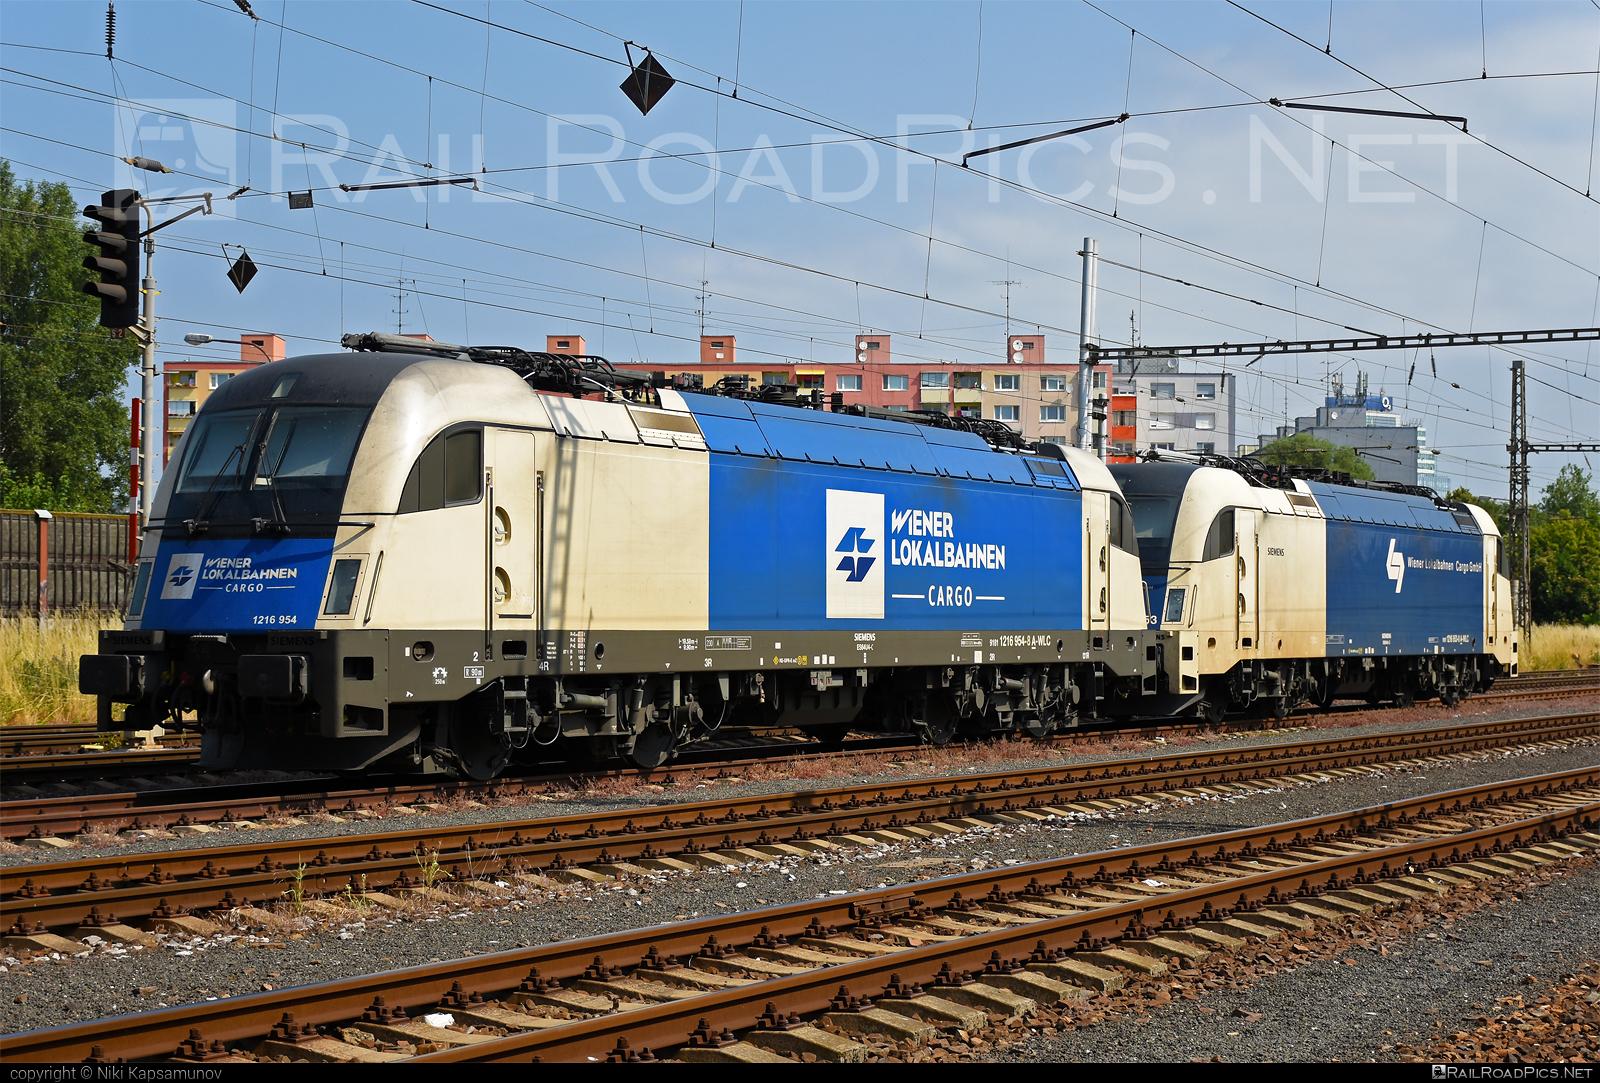 Siemens ES 64 U4 - 1216 954 operated by Wiener Lokalbahnen Cargo GmbH #es64 #es64u #es64u4 #eurosprinter #siemens #siemenses64 #siemenses64u #siemenses64u4 #siemenstaurus #taurus #tauruslocomotive #wienerlokalbahnencargo #wienerlokalbahnencargogmbh #wlc